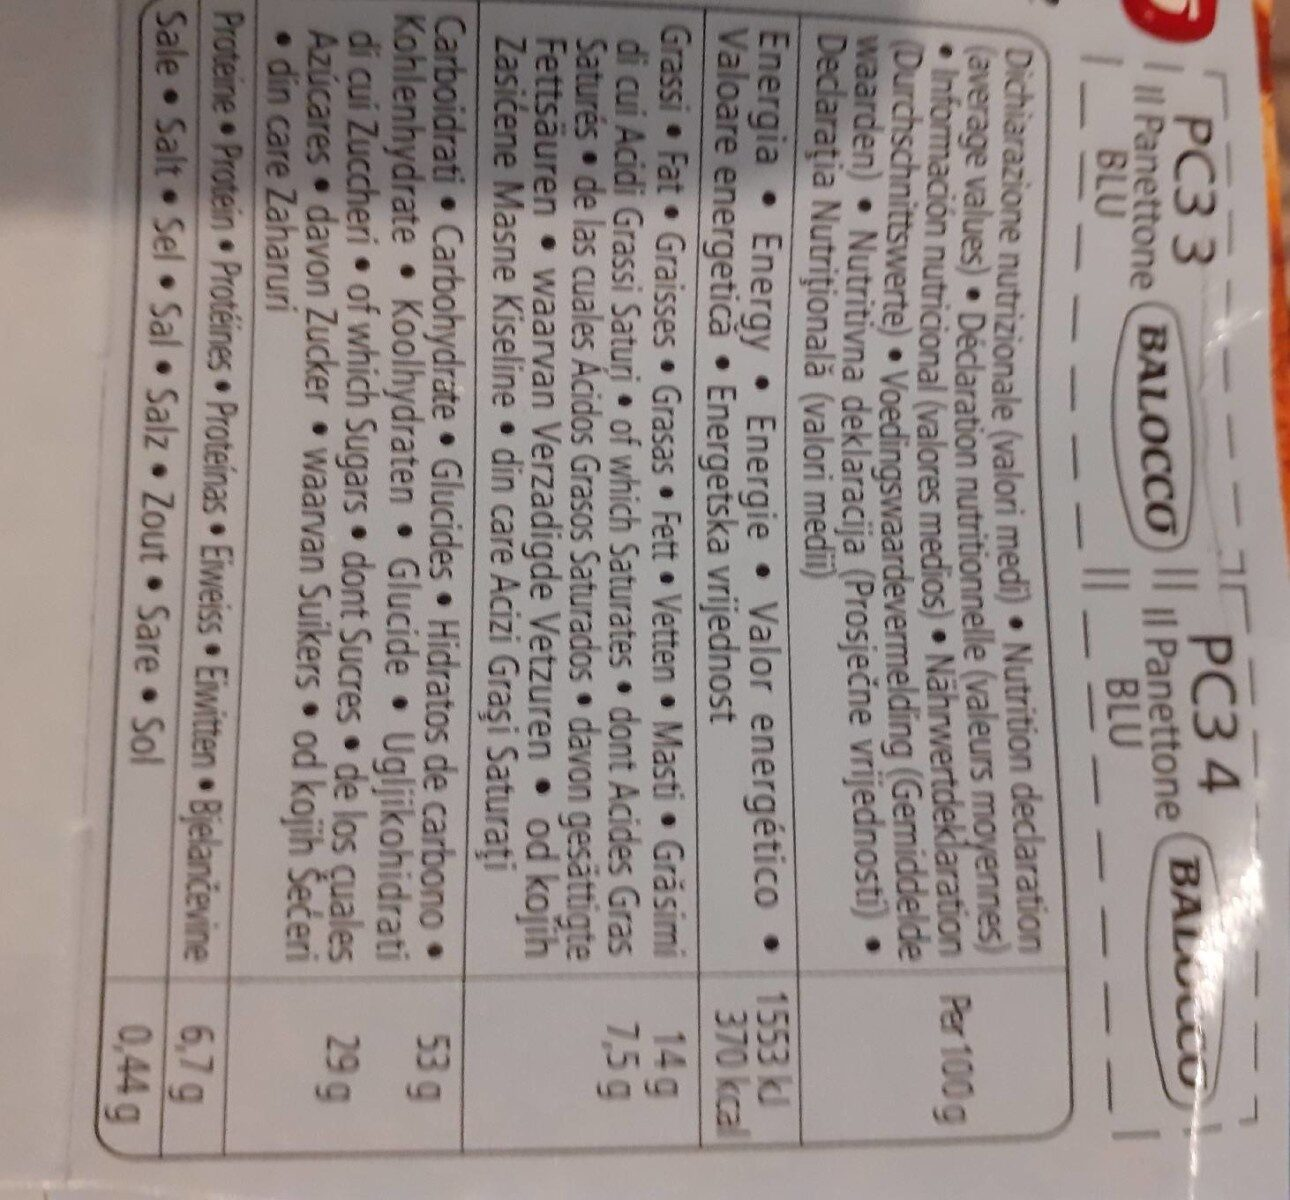 Il Panettone, ricetta tradizionale (recette traditionnelle) - Nutrition facts - fr